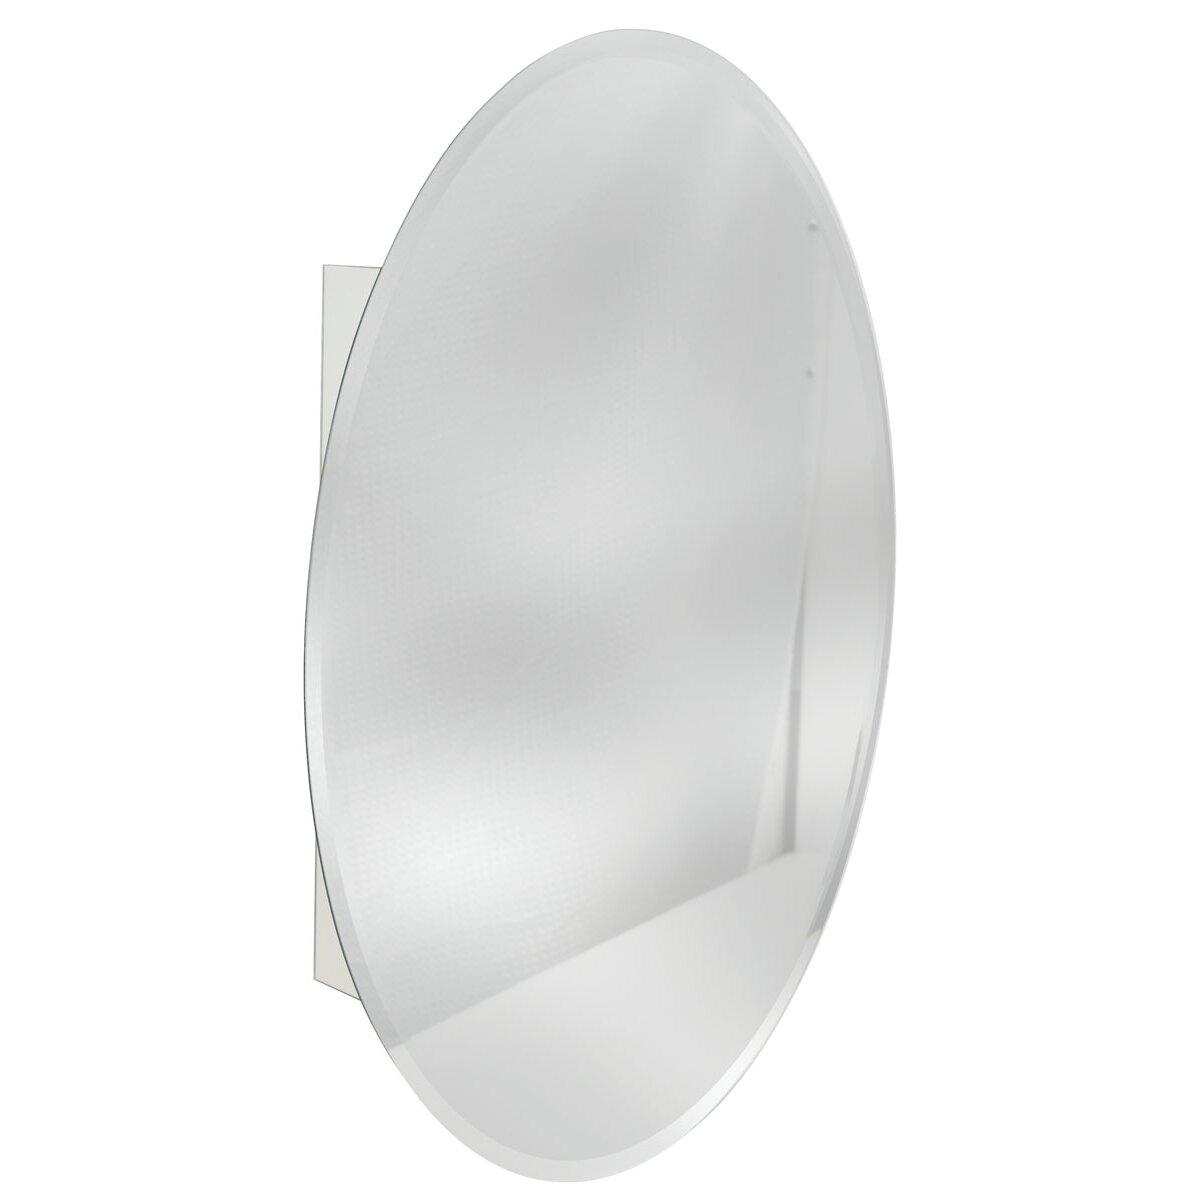 Oval Mirror Medicine Cabinet Zenith 21 X 32 Surface Mount Medicine Cabinet Reviews Wayfair